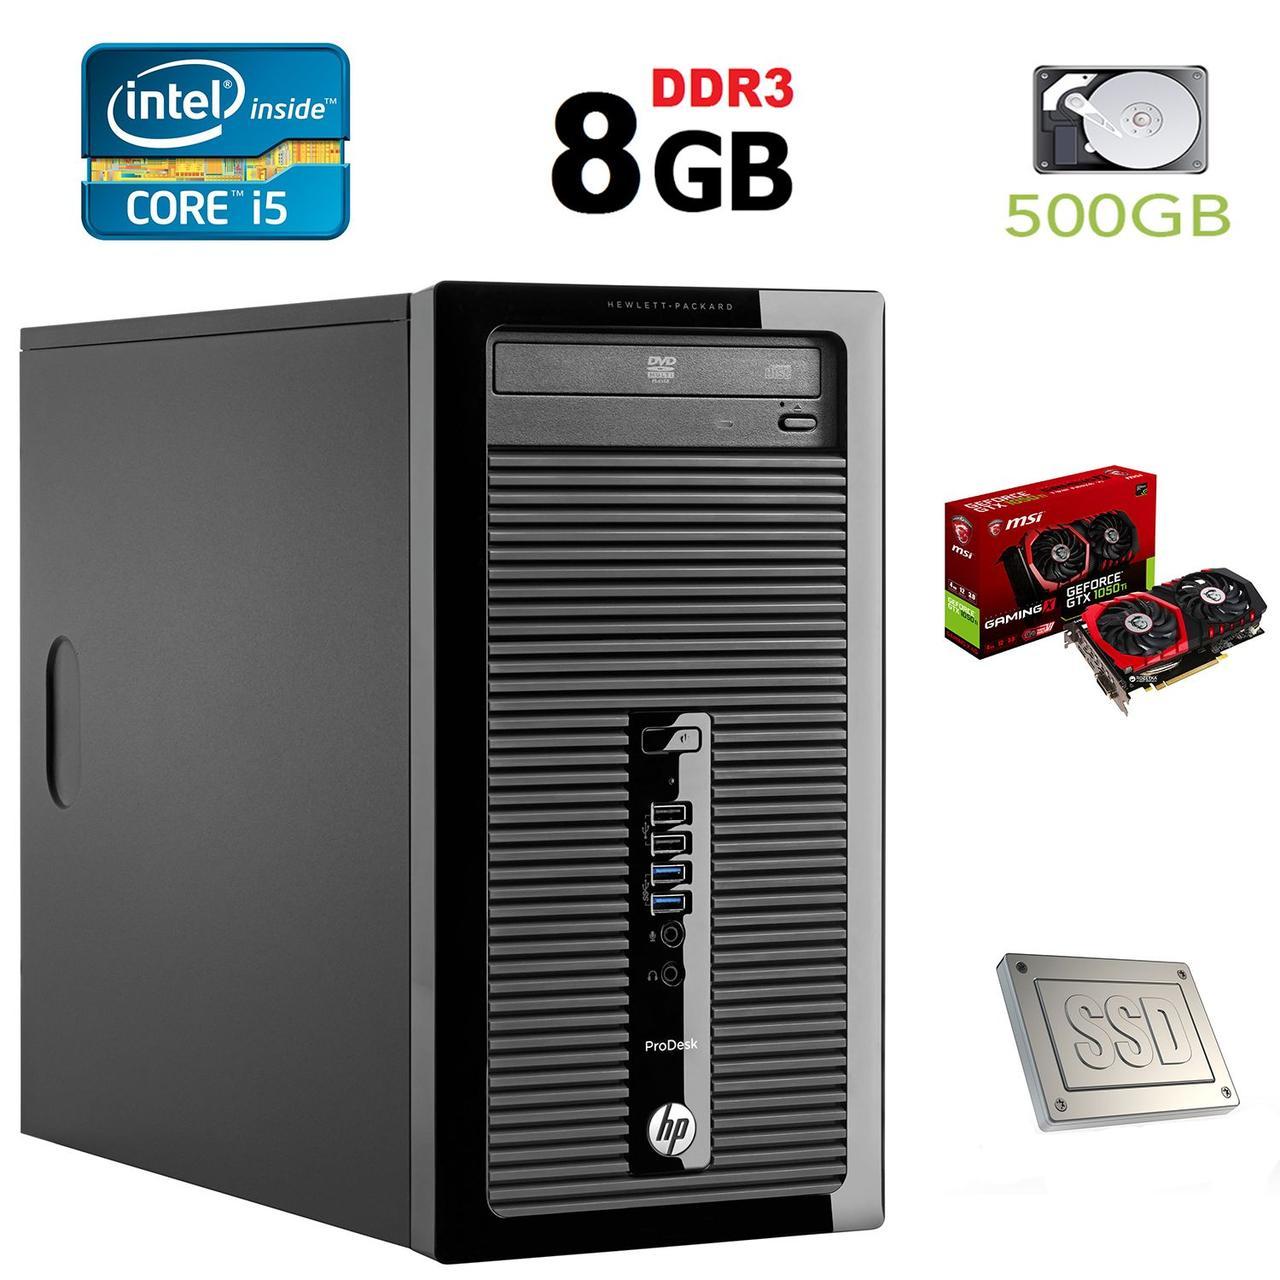 HP 400 G1 MT / Intel Core i5-4460 (4 ядра по 3.4GHz) / 8GB DDR3 / 120GB SSD + 500GB HDD / new! GeForce GTX 1050Ti 4GB GDDR5 / БП-500W